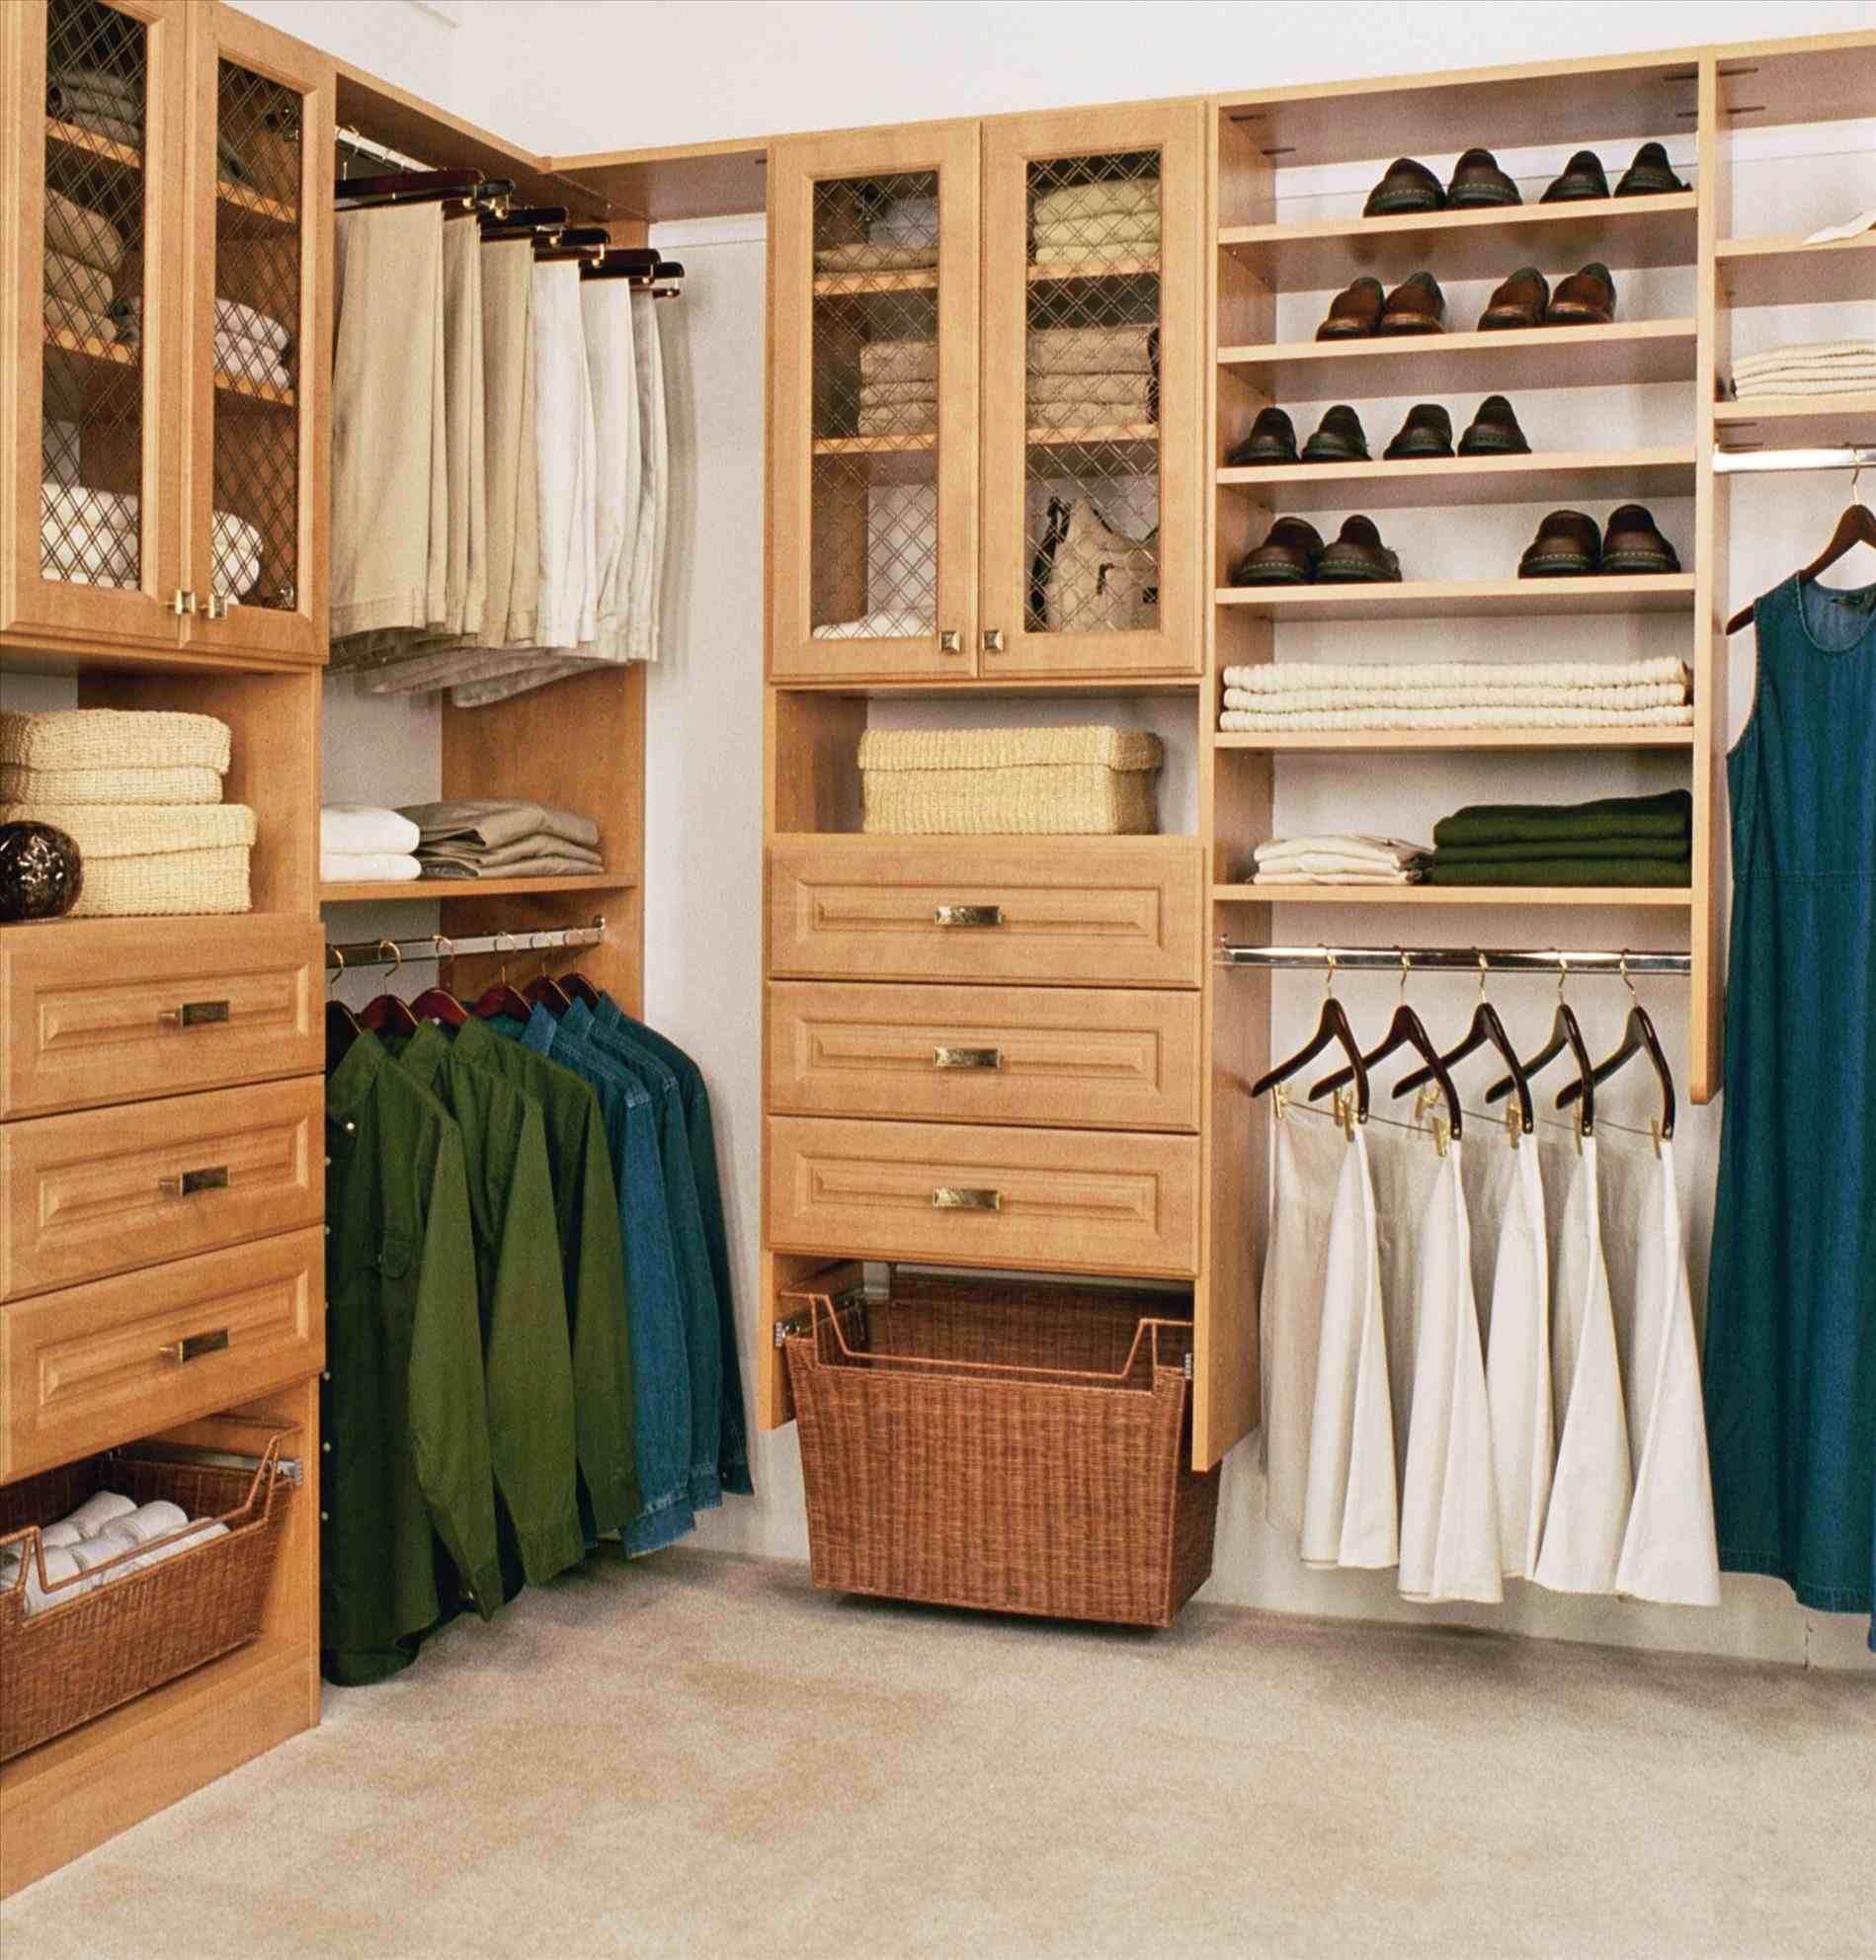 Small Bedroom Closet Design Interesting This Custom Master Bedroom Closets  Full Size Of Bedroomcloset Inspiration Design